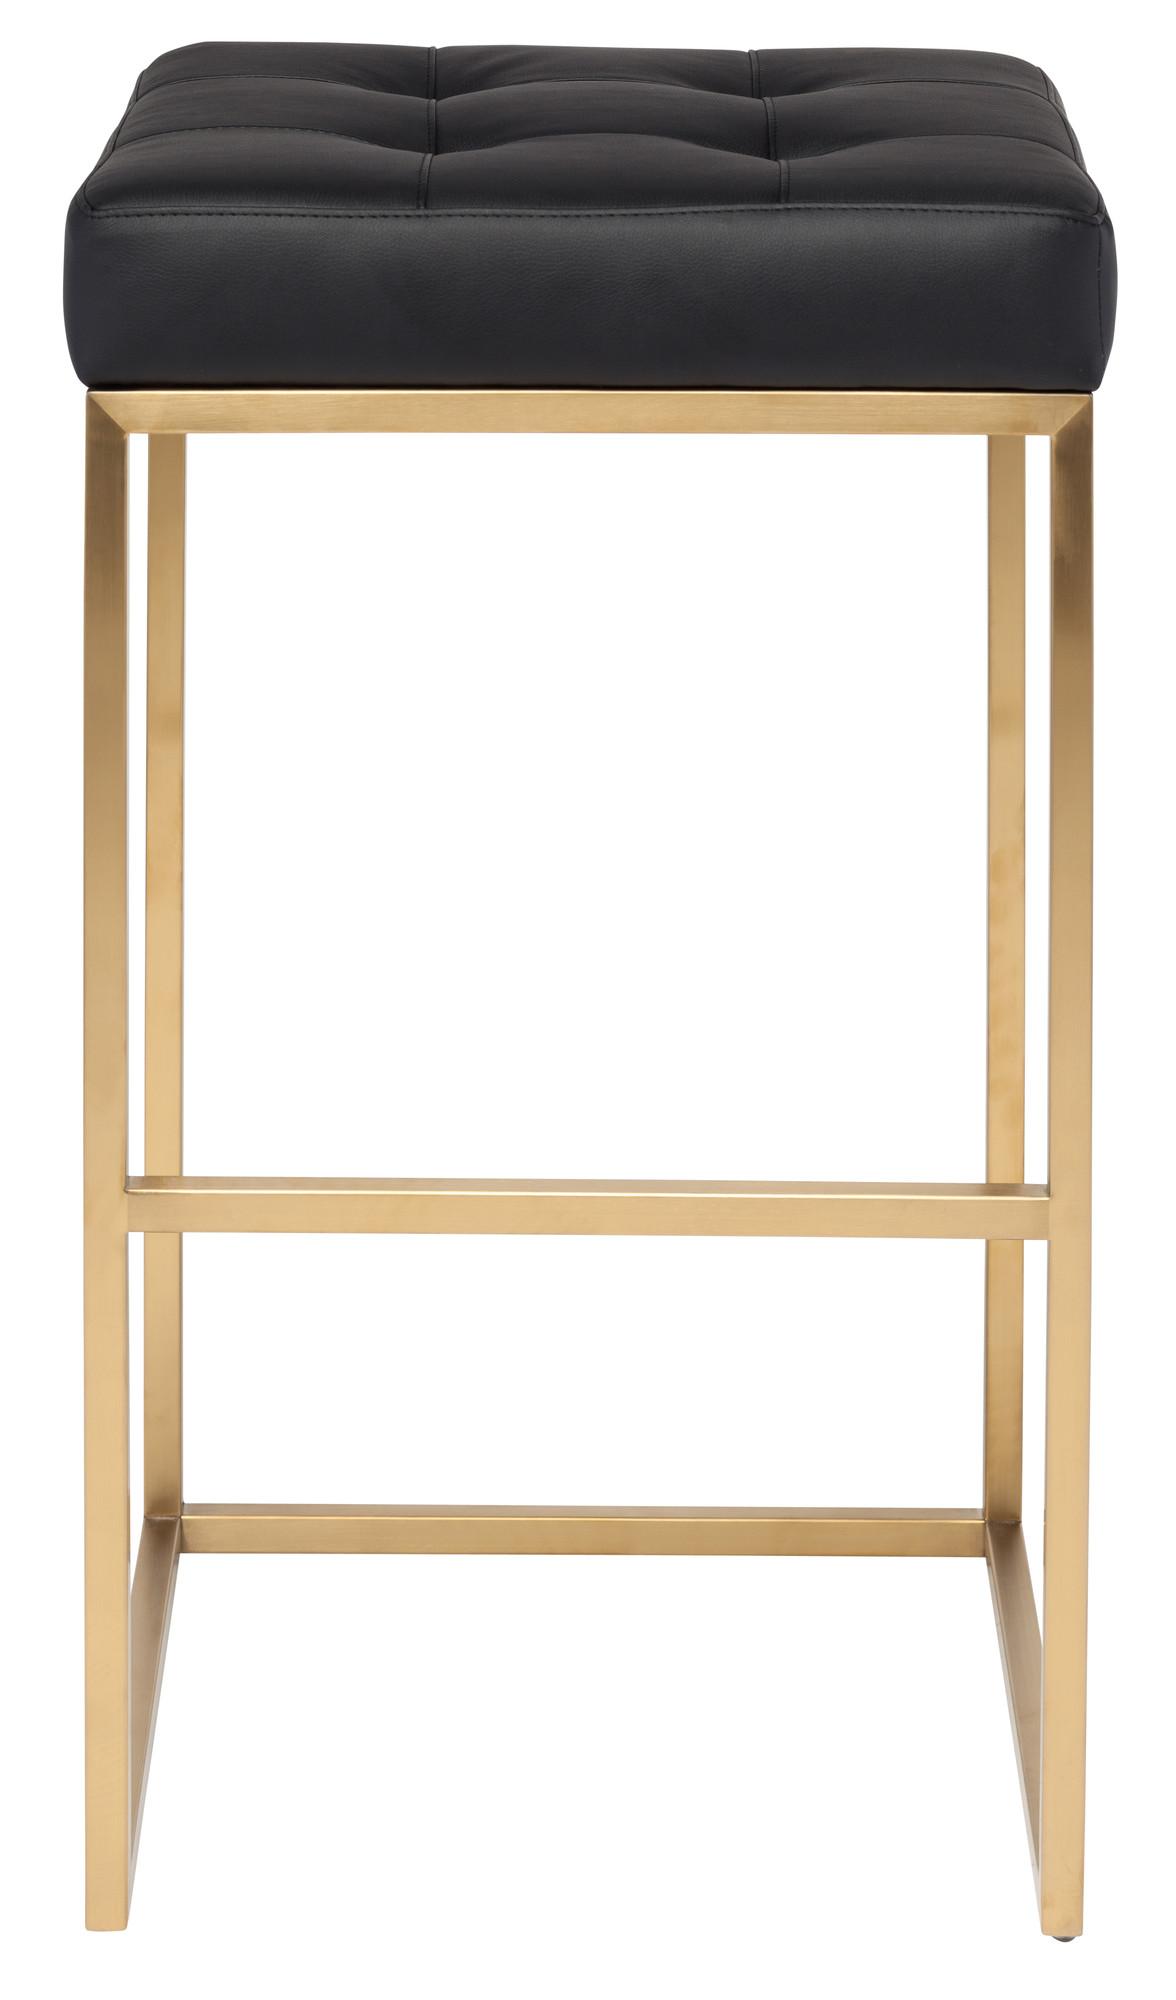 chi-bar-stool-black-gold.jpg